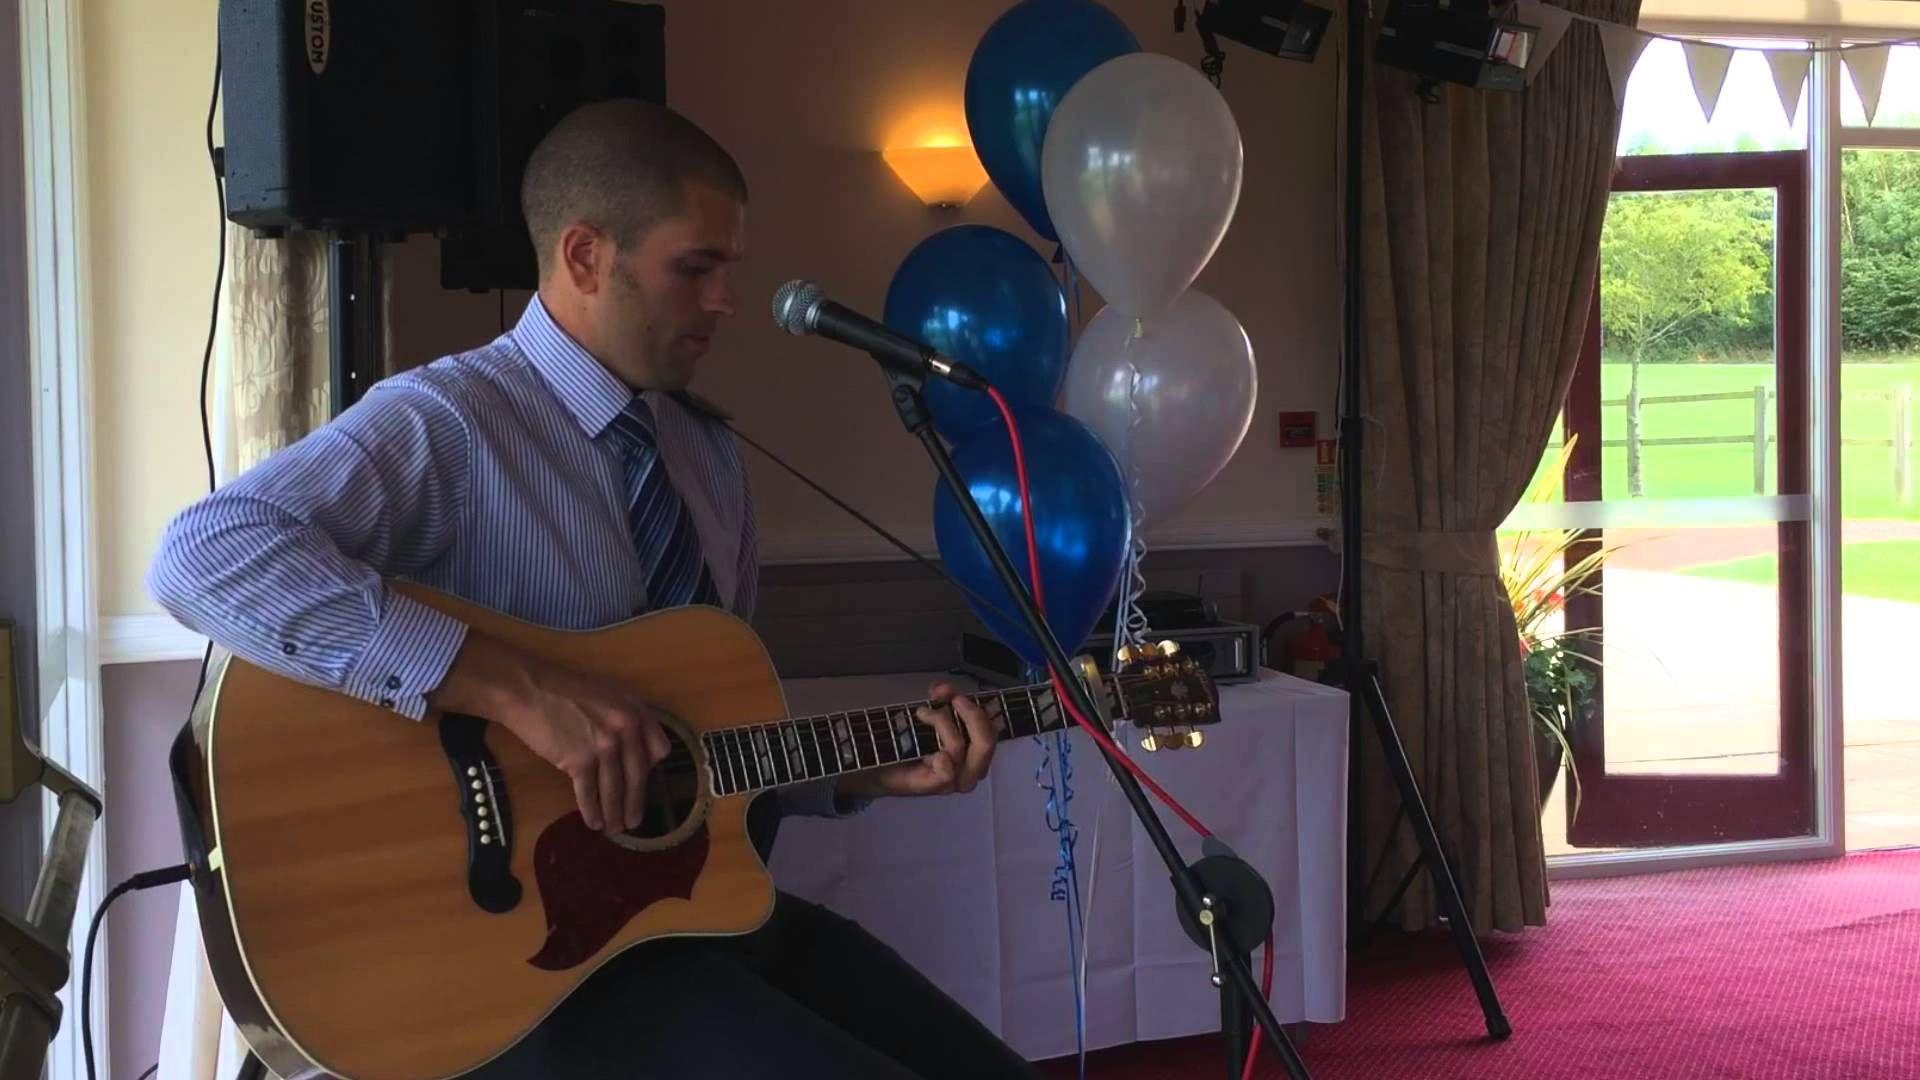 47+ Stream the wedding singer free information